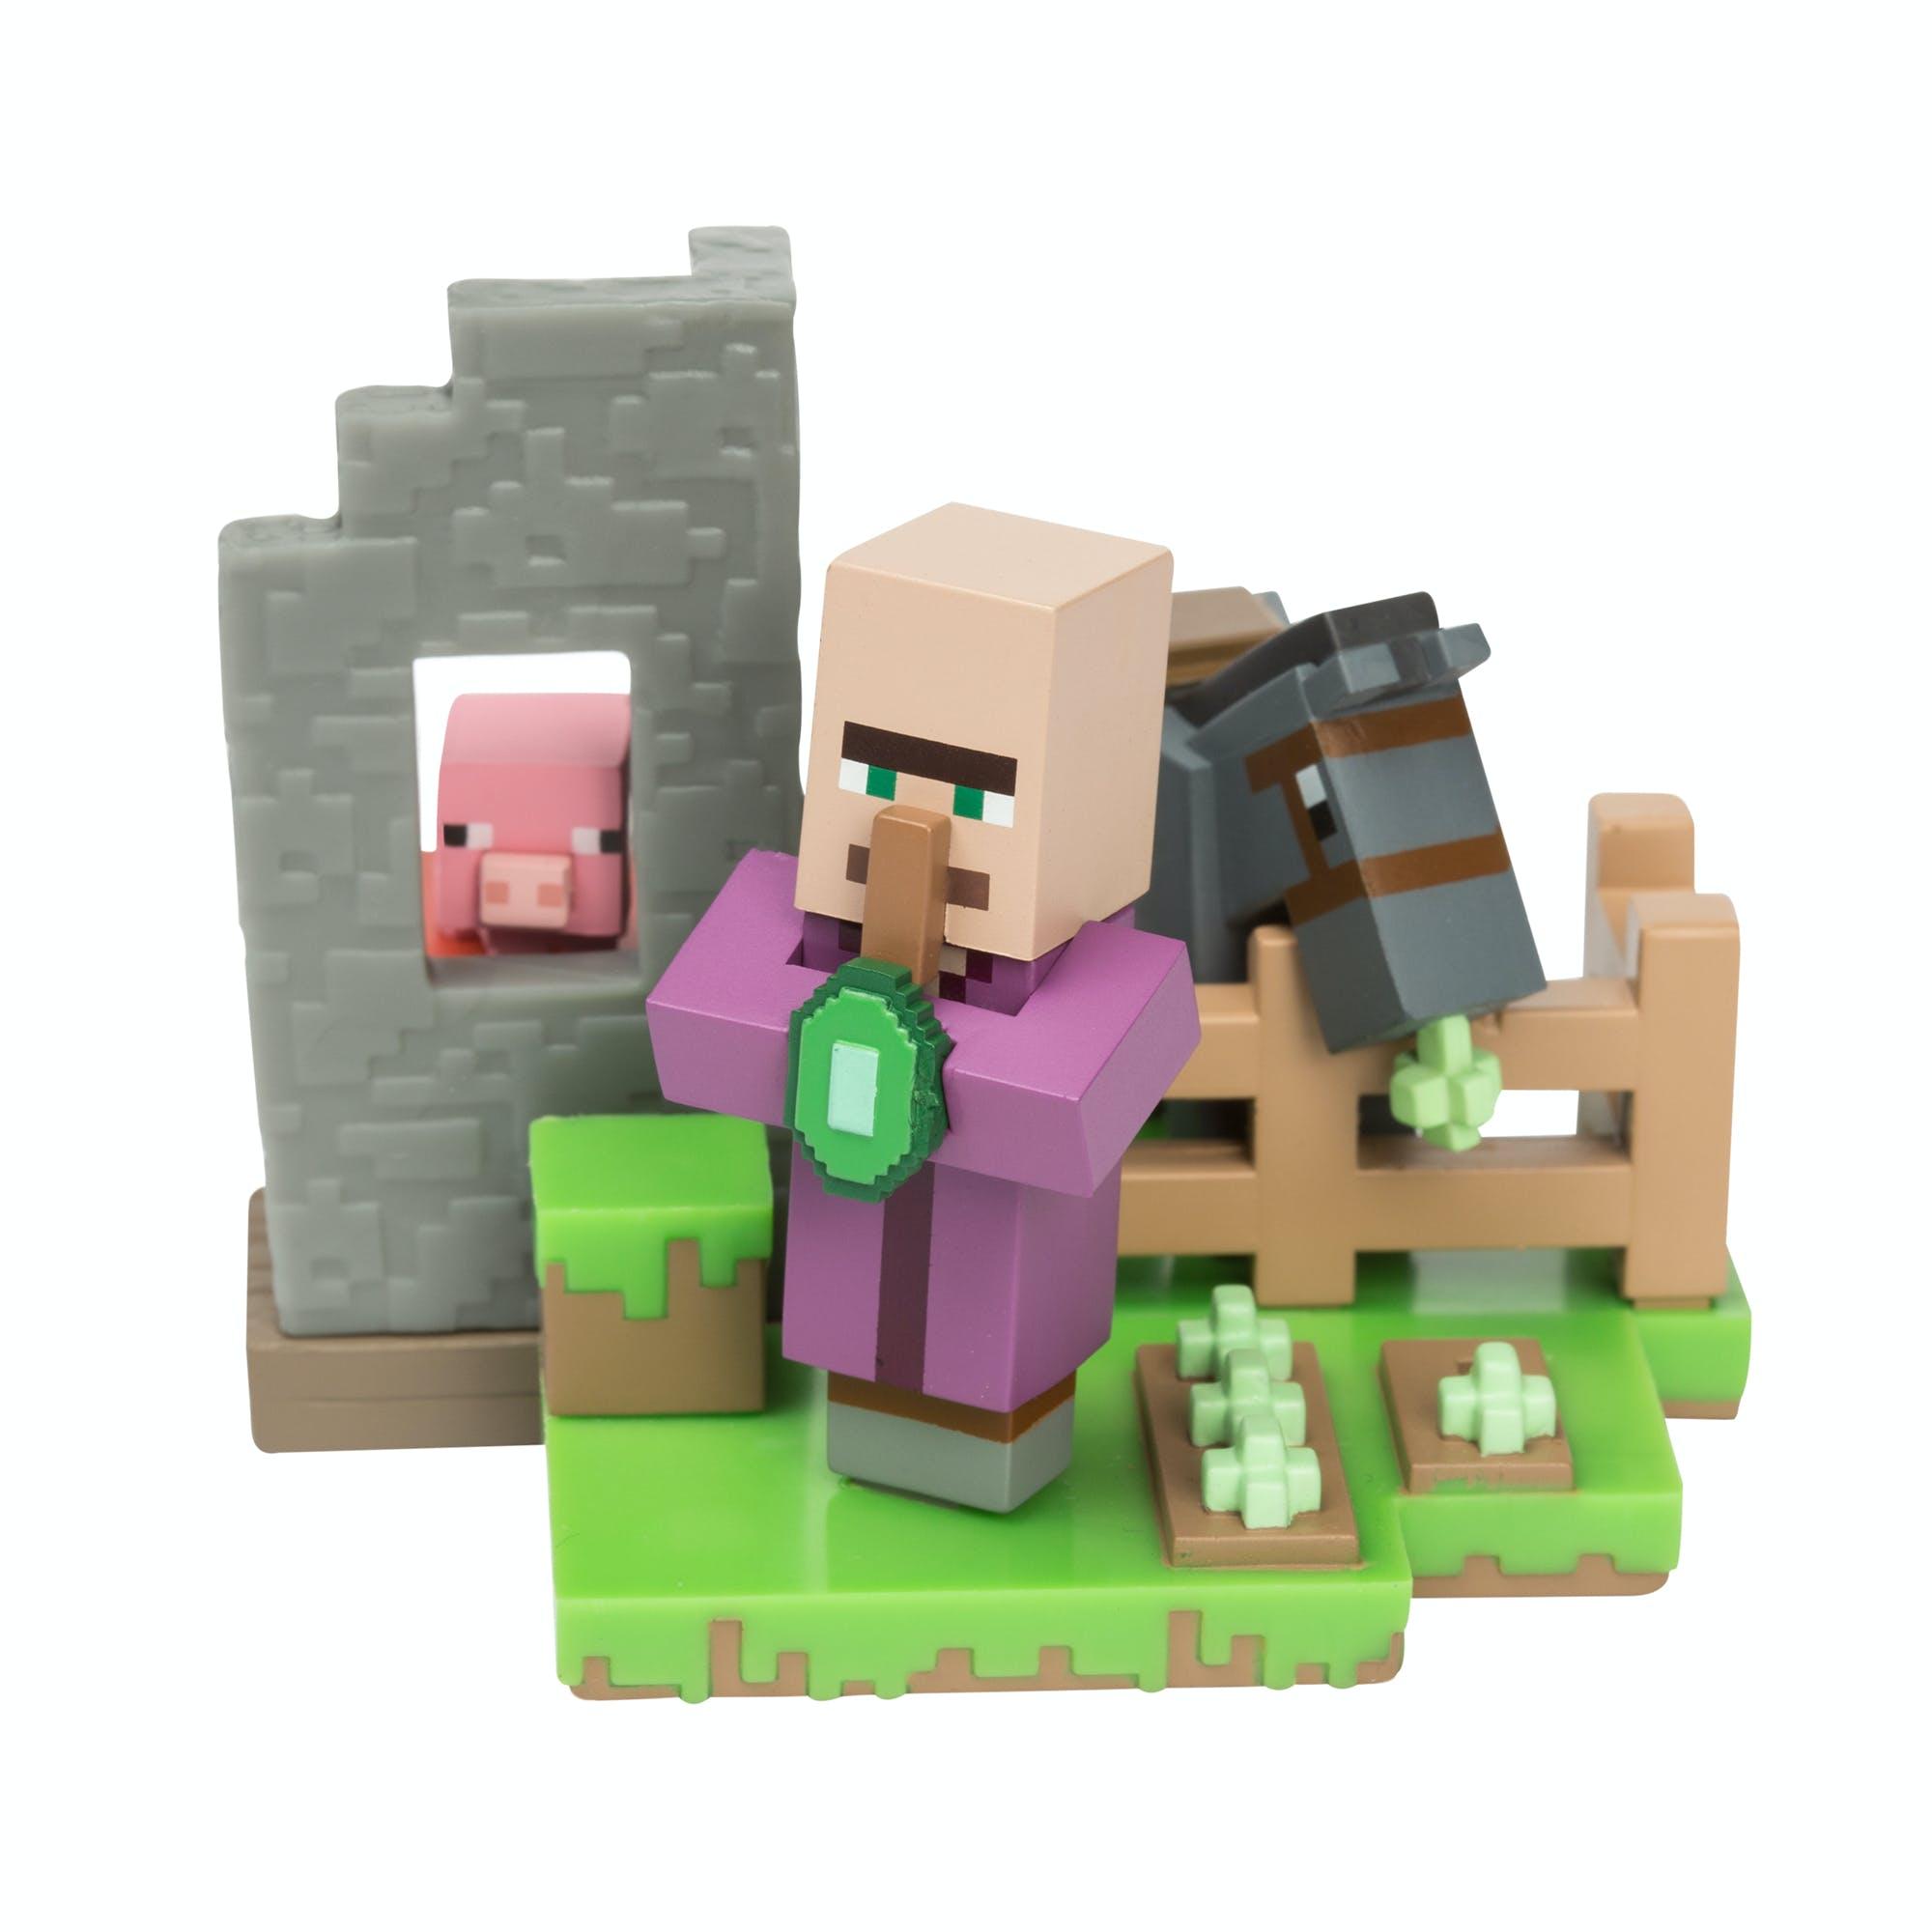 Minecraft Craftables by J!NX